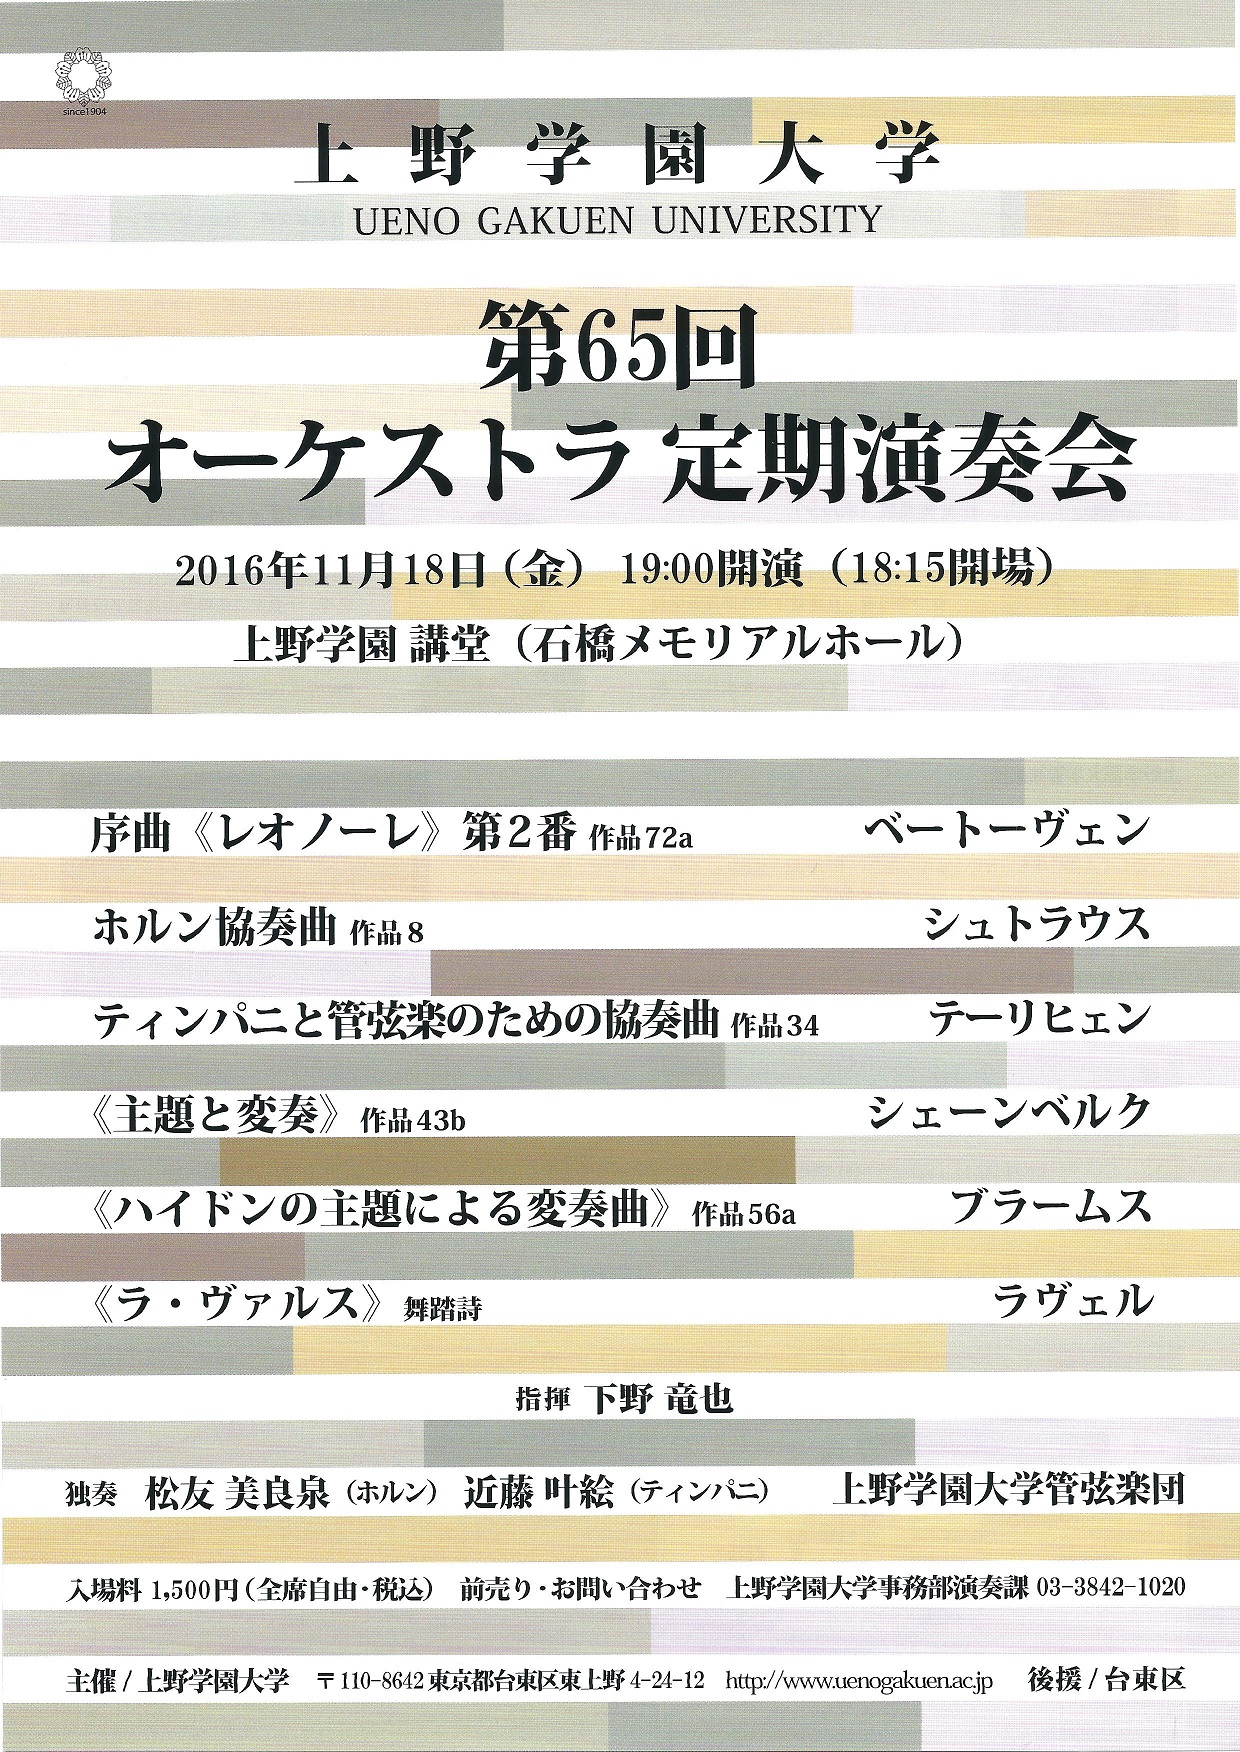 This week's concert (14 November – 20 November, 2016)